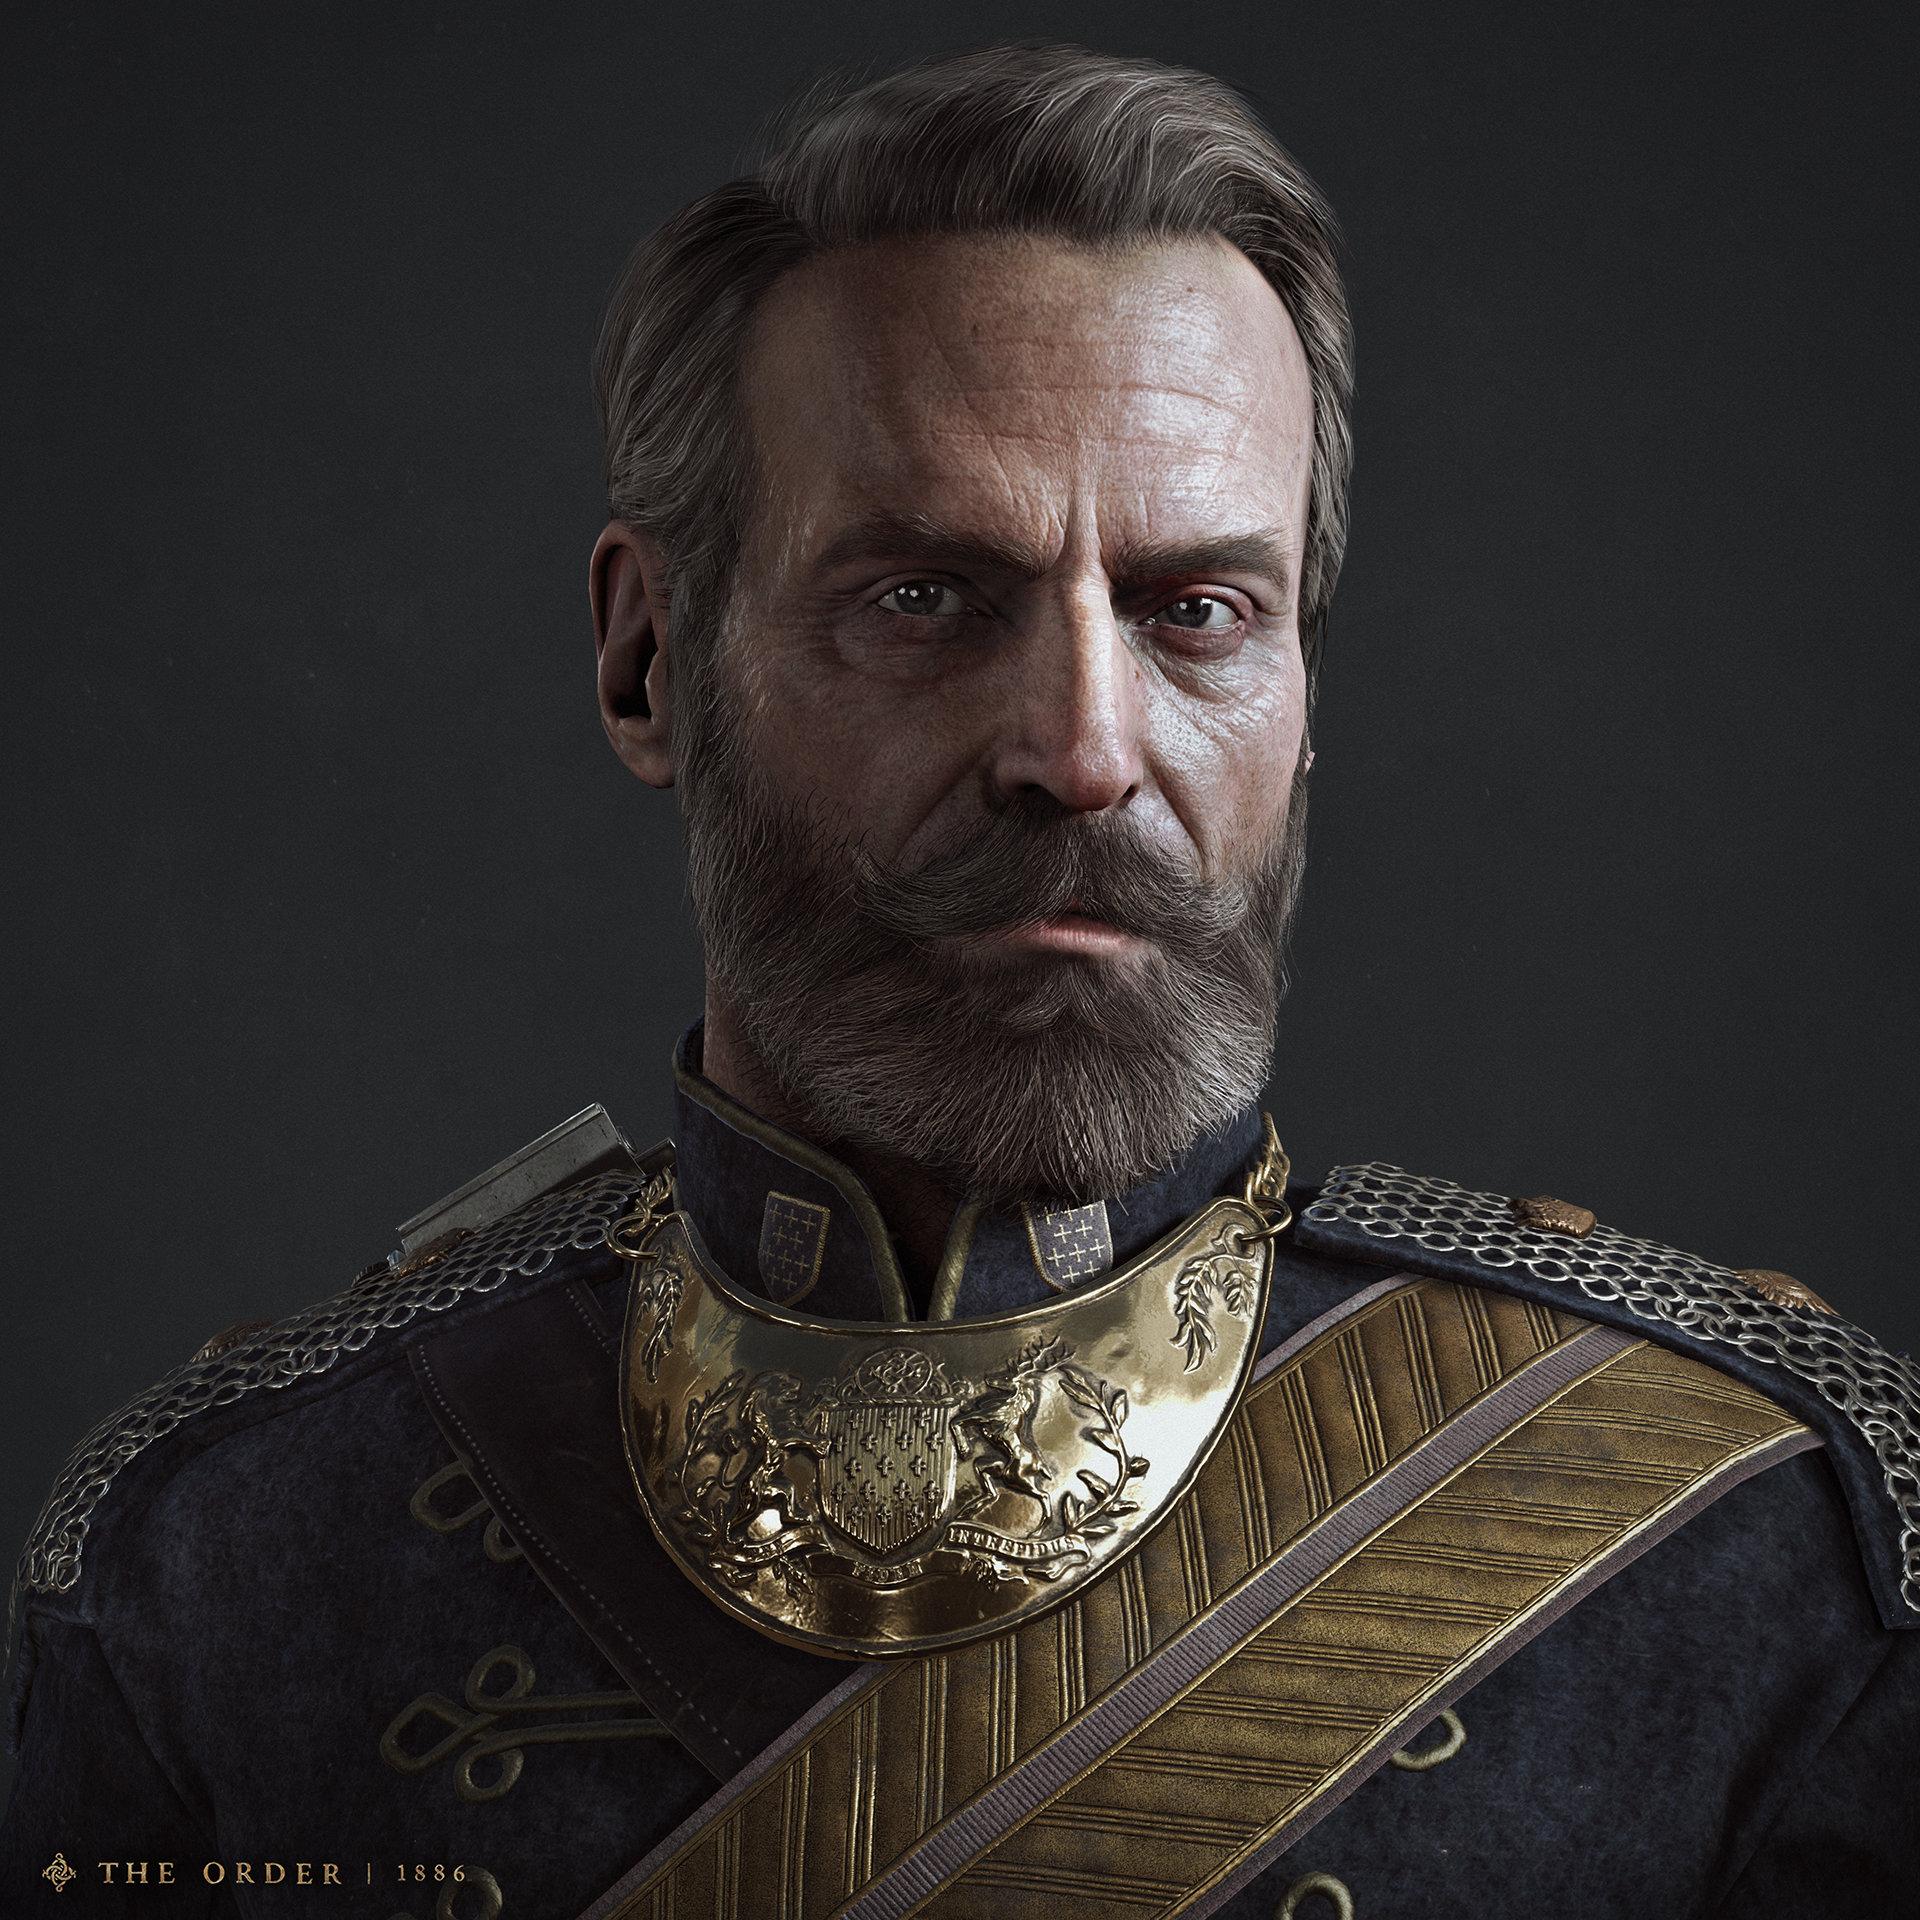 scot-andreason-mlr-portrait